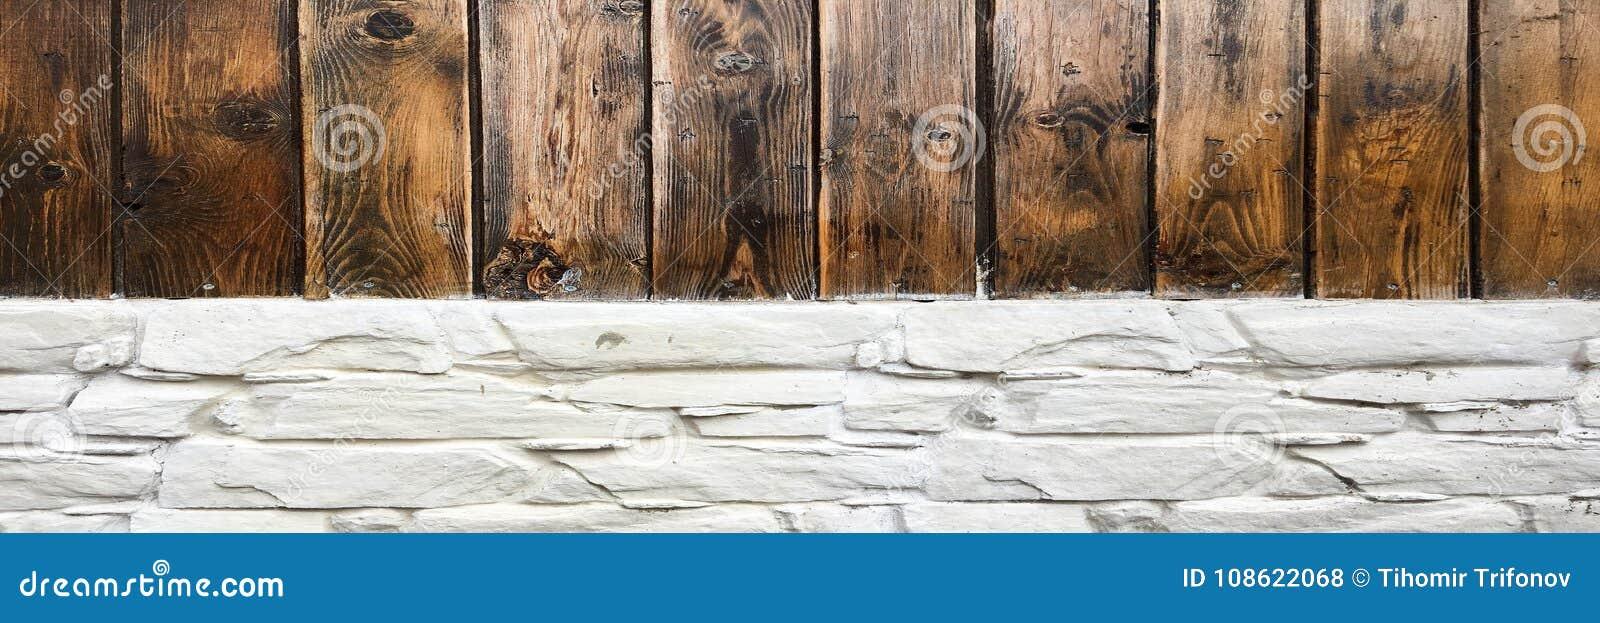 Peindre Un Mur En Pierre fond de mur en pierre texture peinte par blanc de mur en pierre